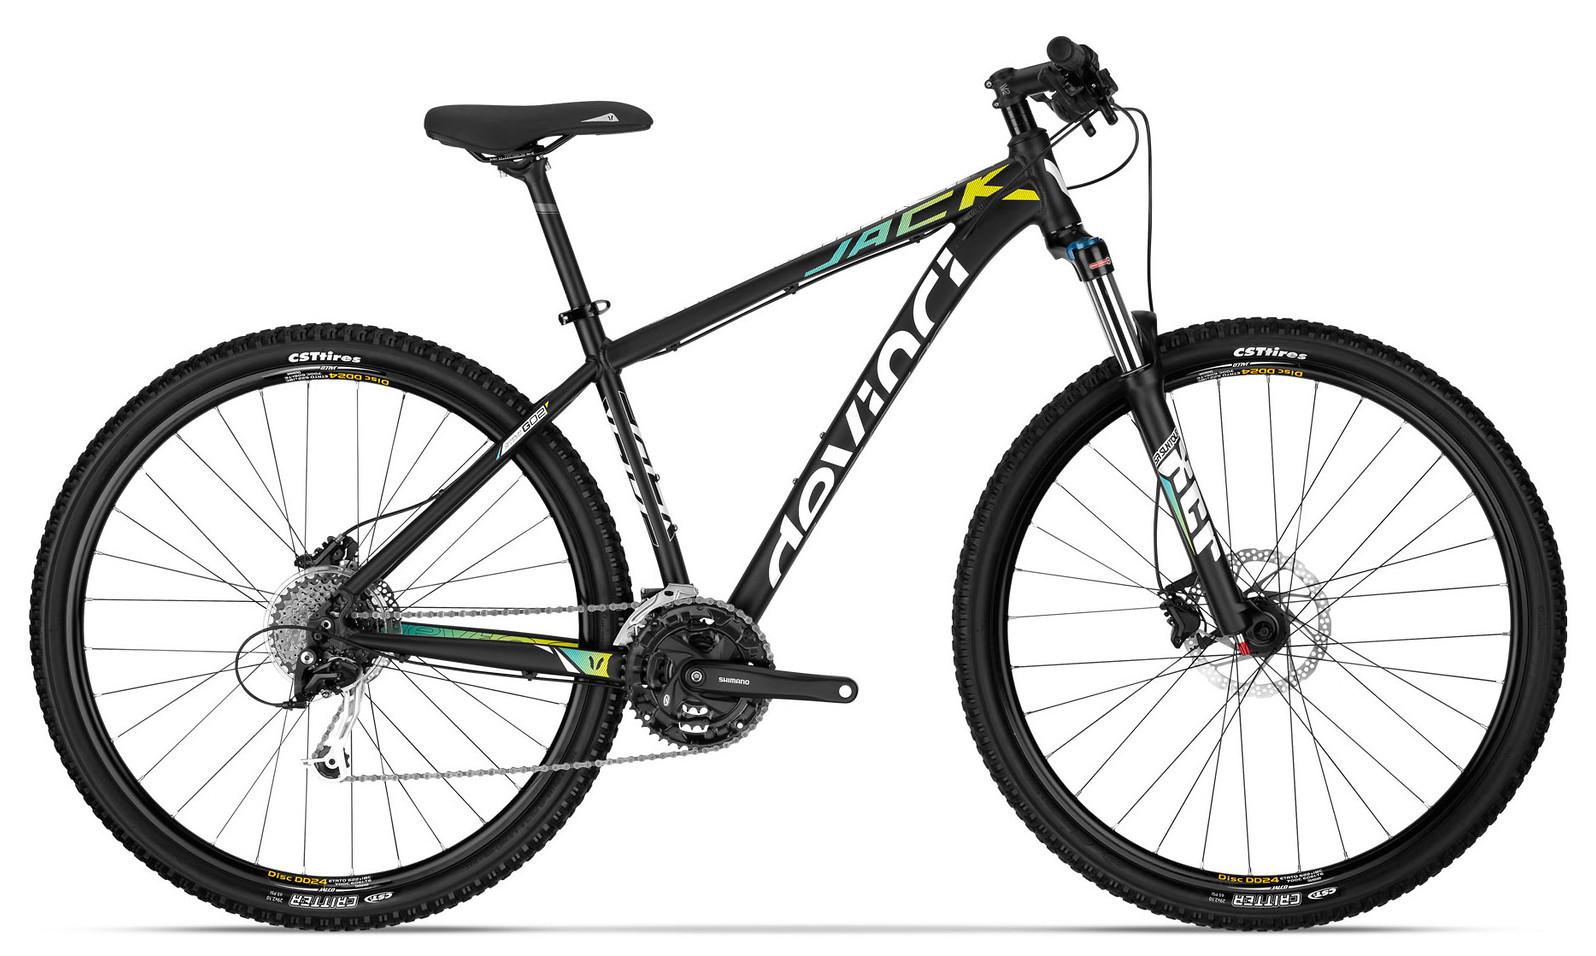 Bike - 2014 Devinci Jack SX